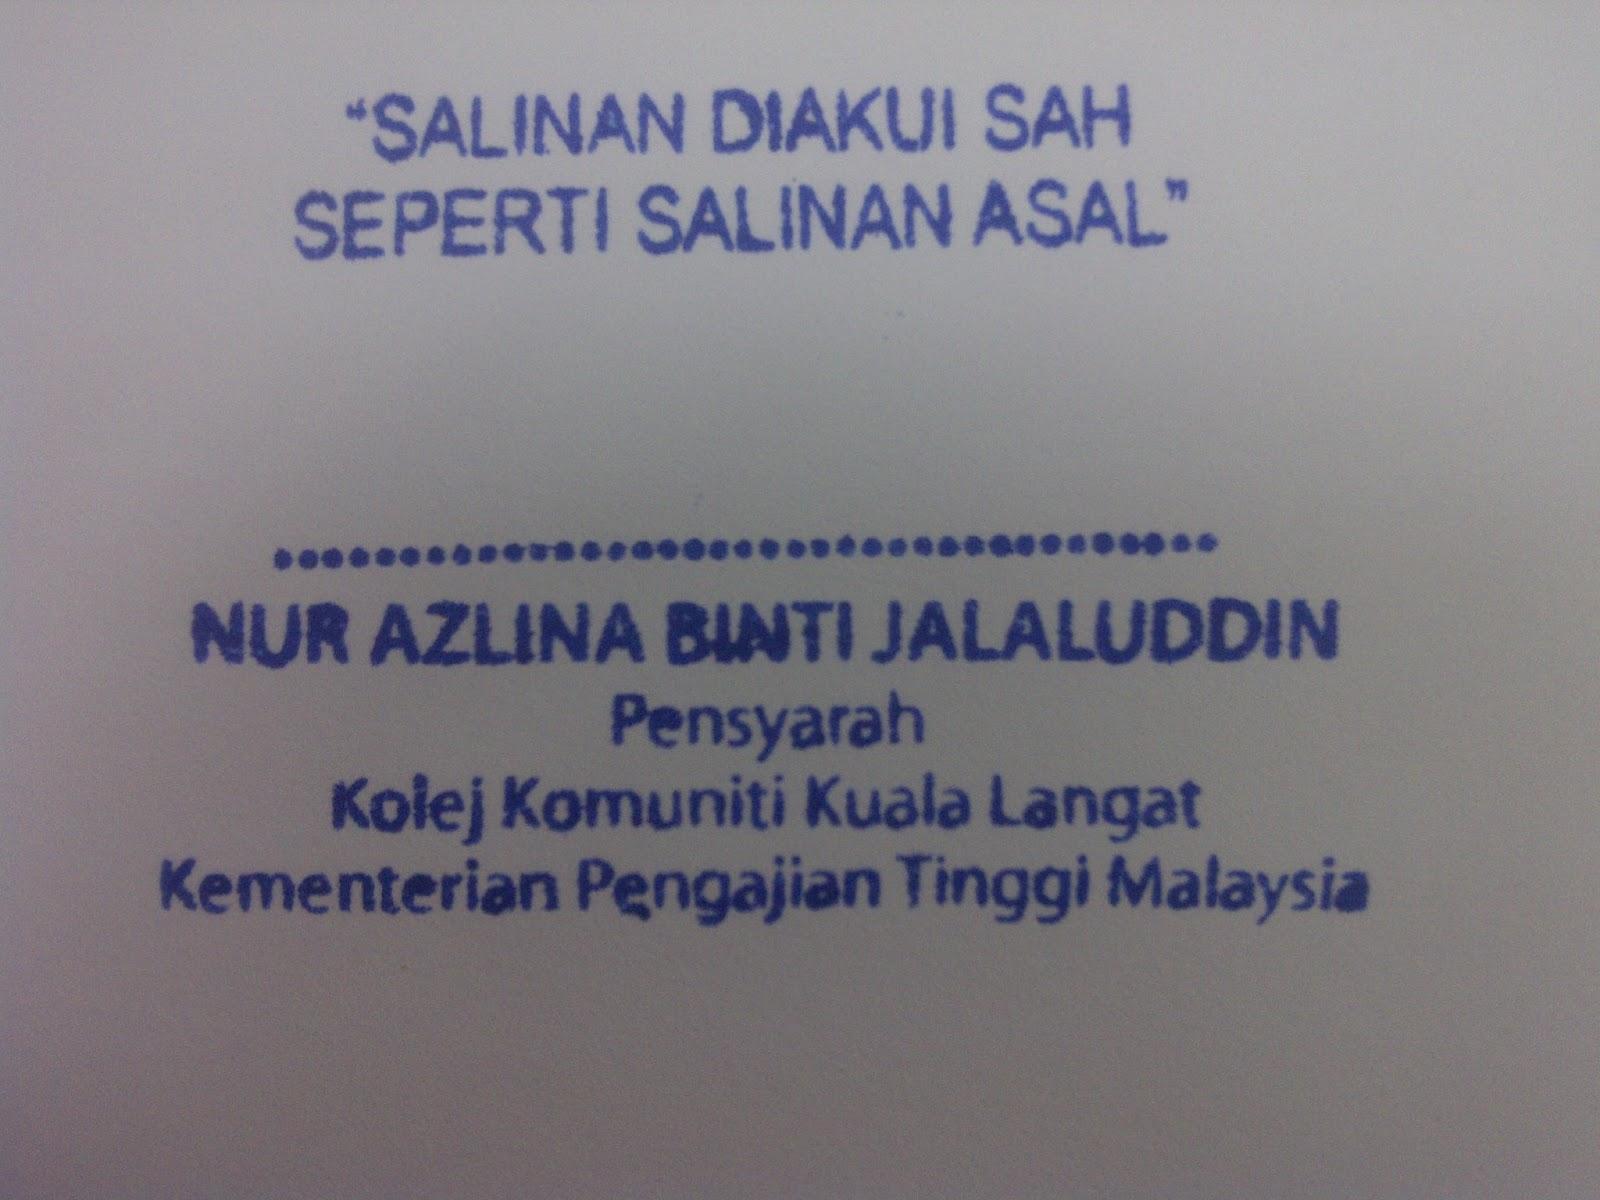 Salinan Diakui Sah Certified True Copy